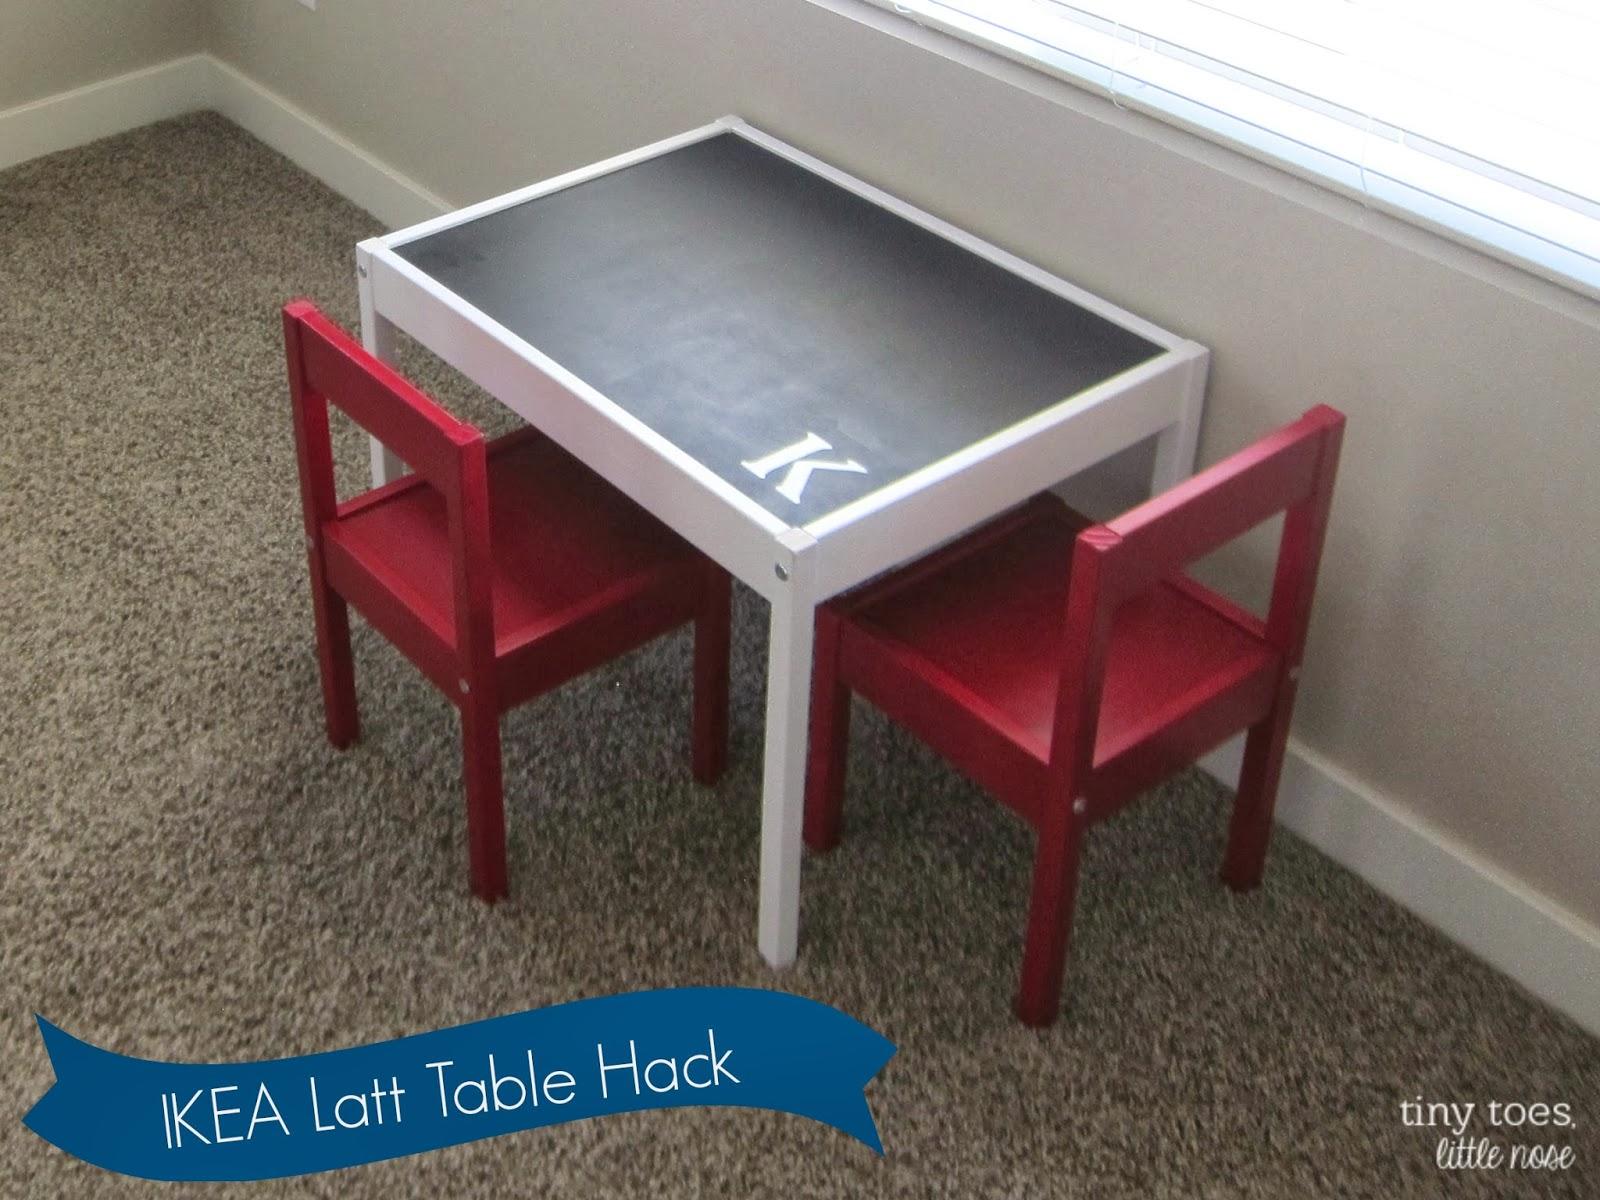 IKEA Latt Table Hack